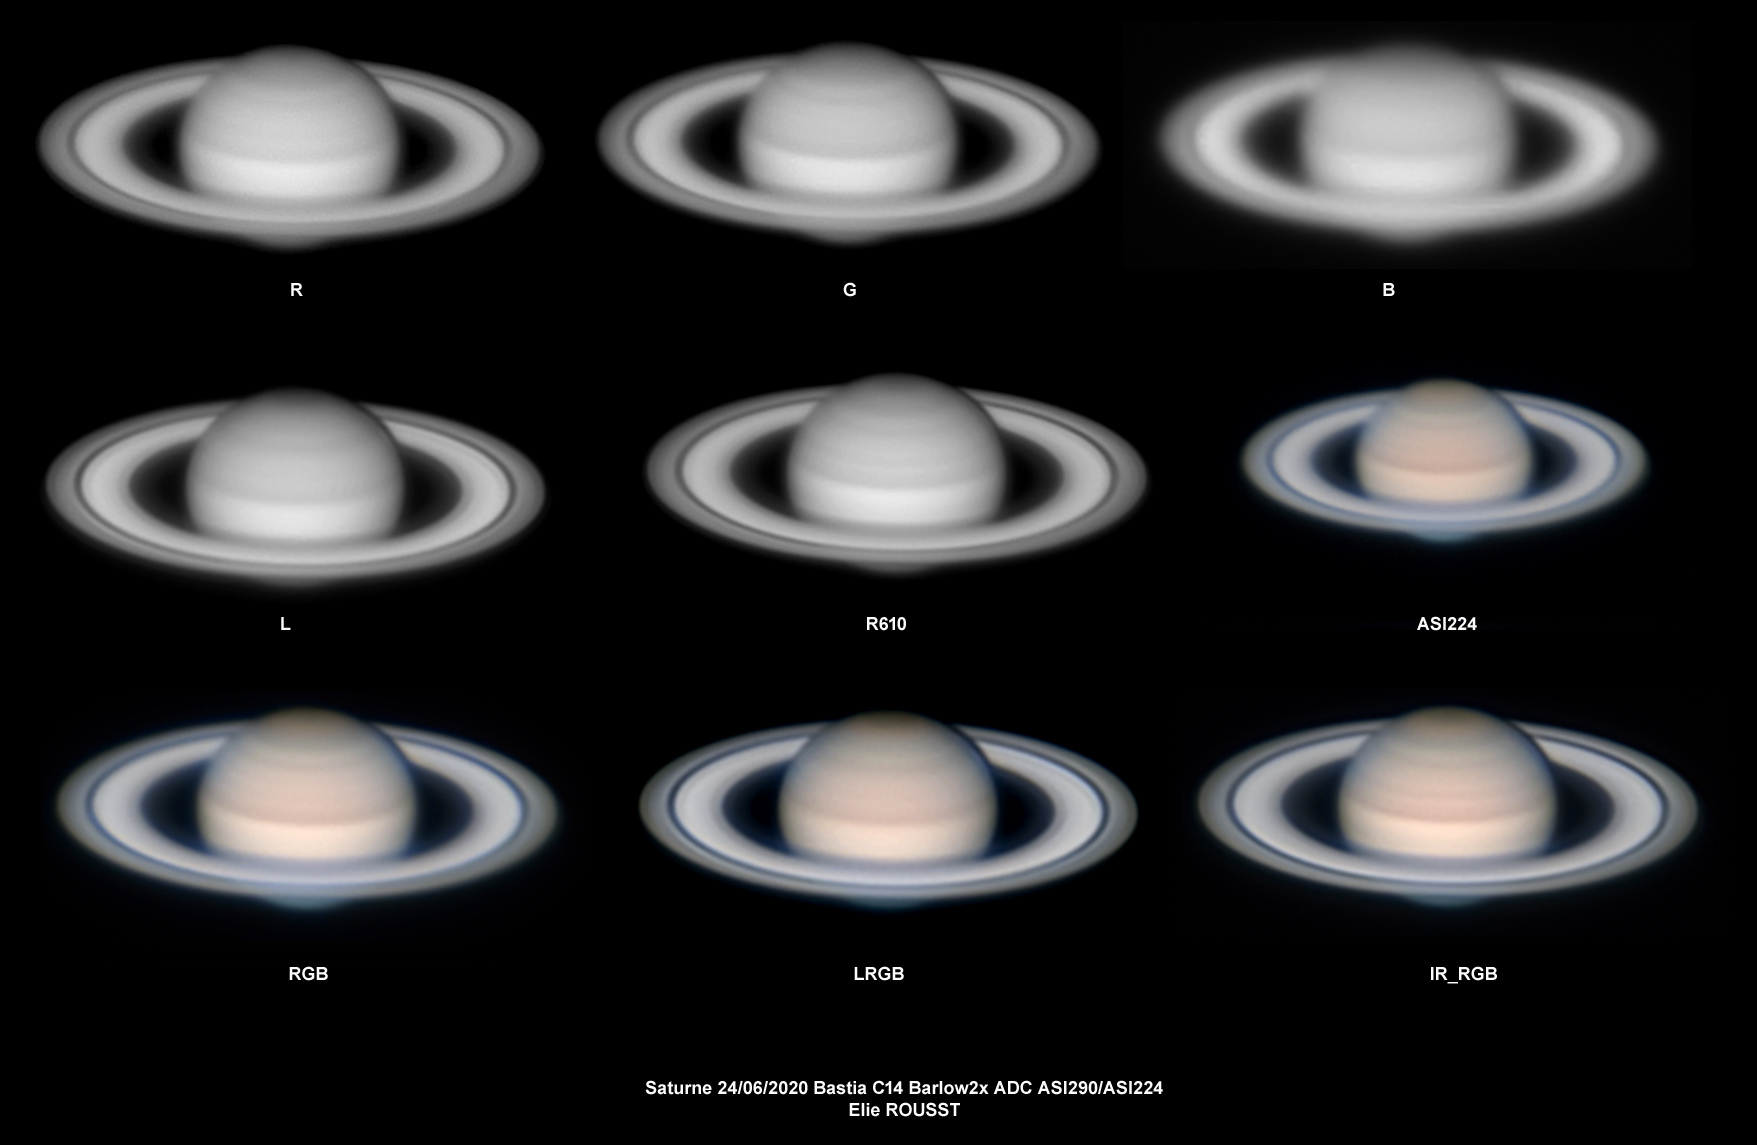 large.Saturne-24-06-2020-Planche-.jpg.dbbc146ce08705355a71a253dc8ce511.jpg